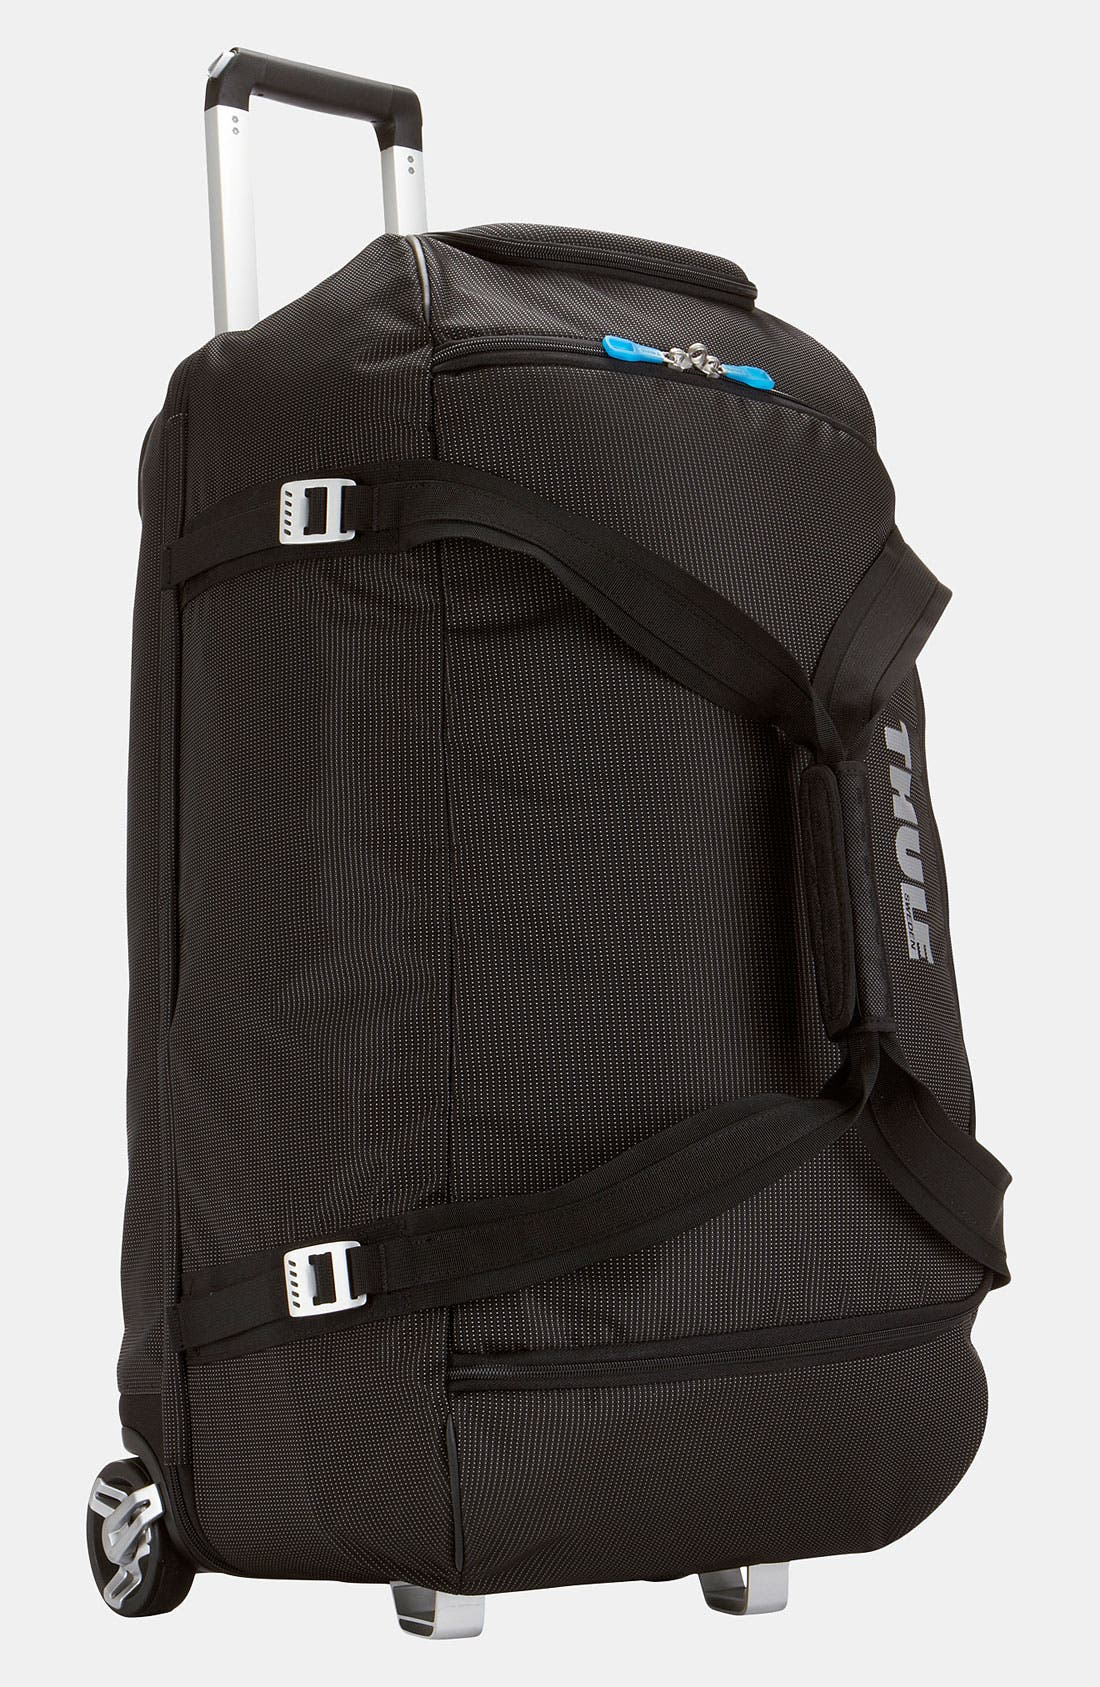 THULE Crossover Rolling Duffel Bag